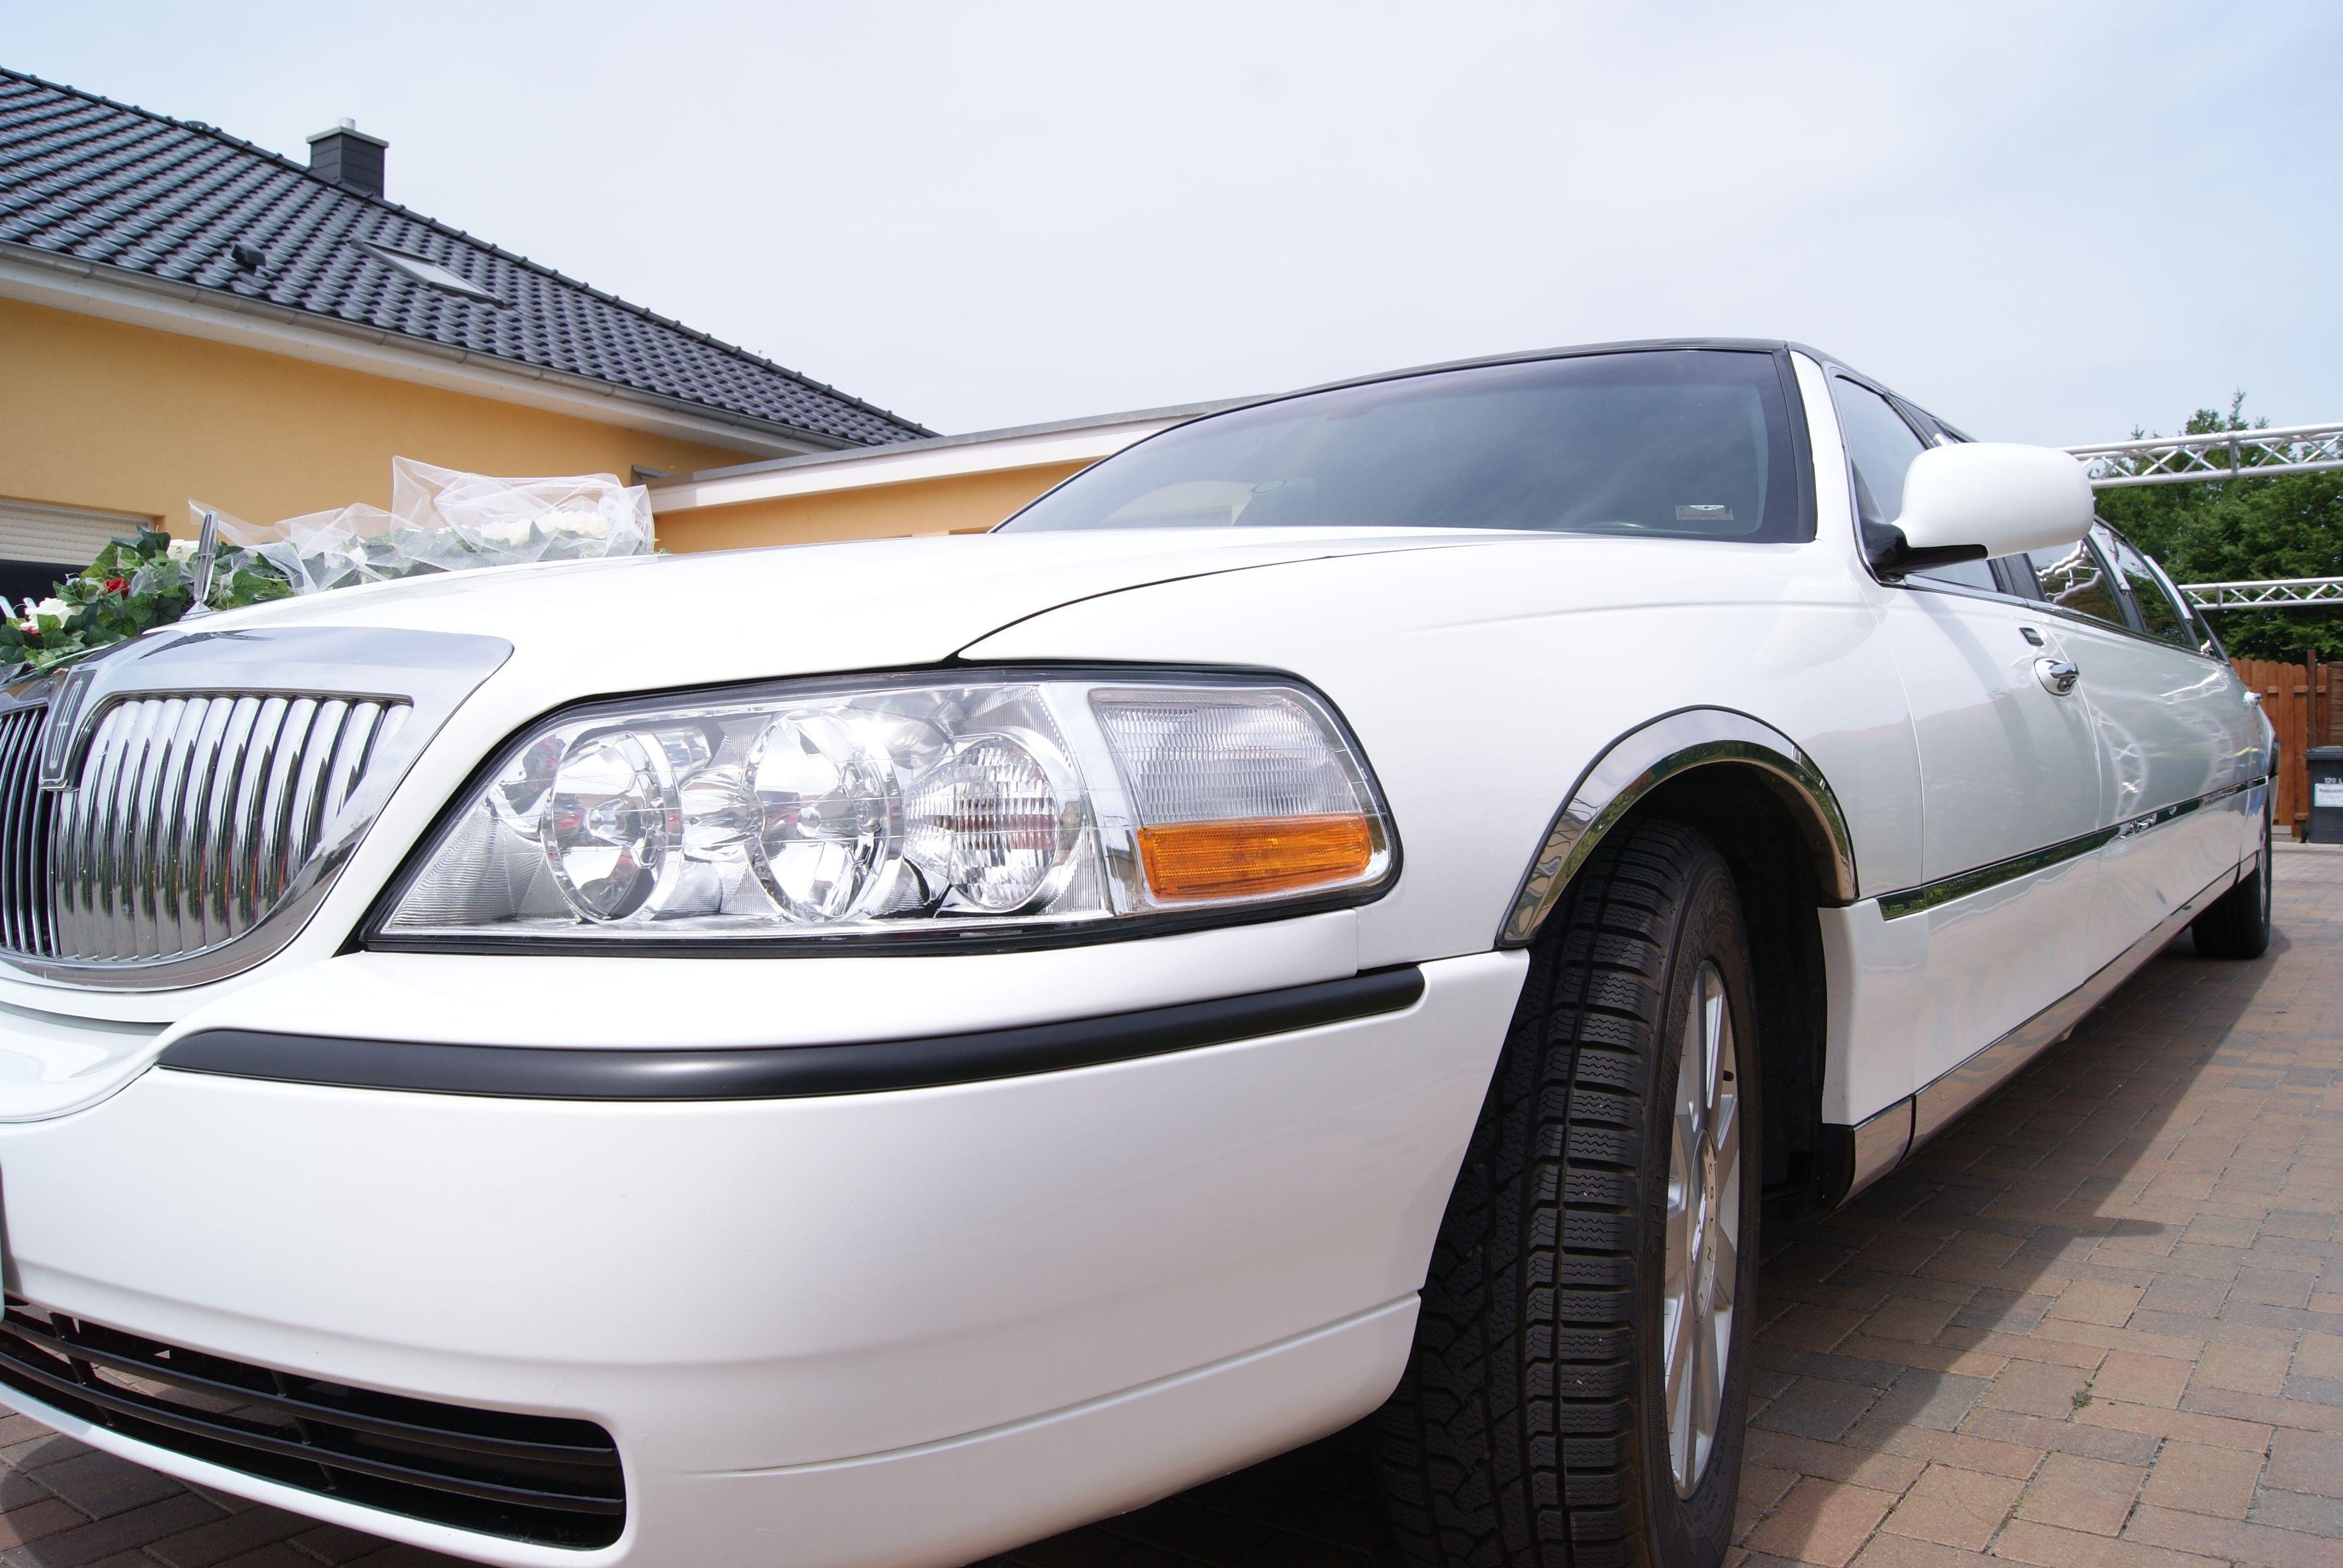 Lincoln Stretchlimousine Leipzig Limousine